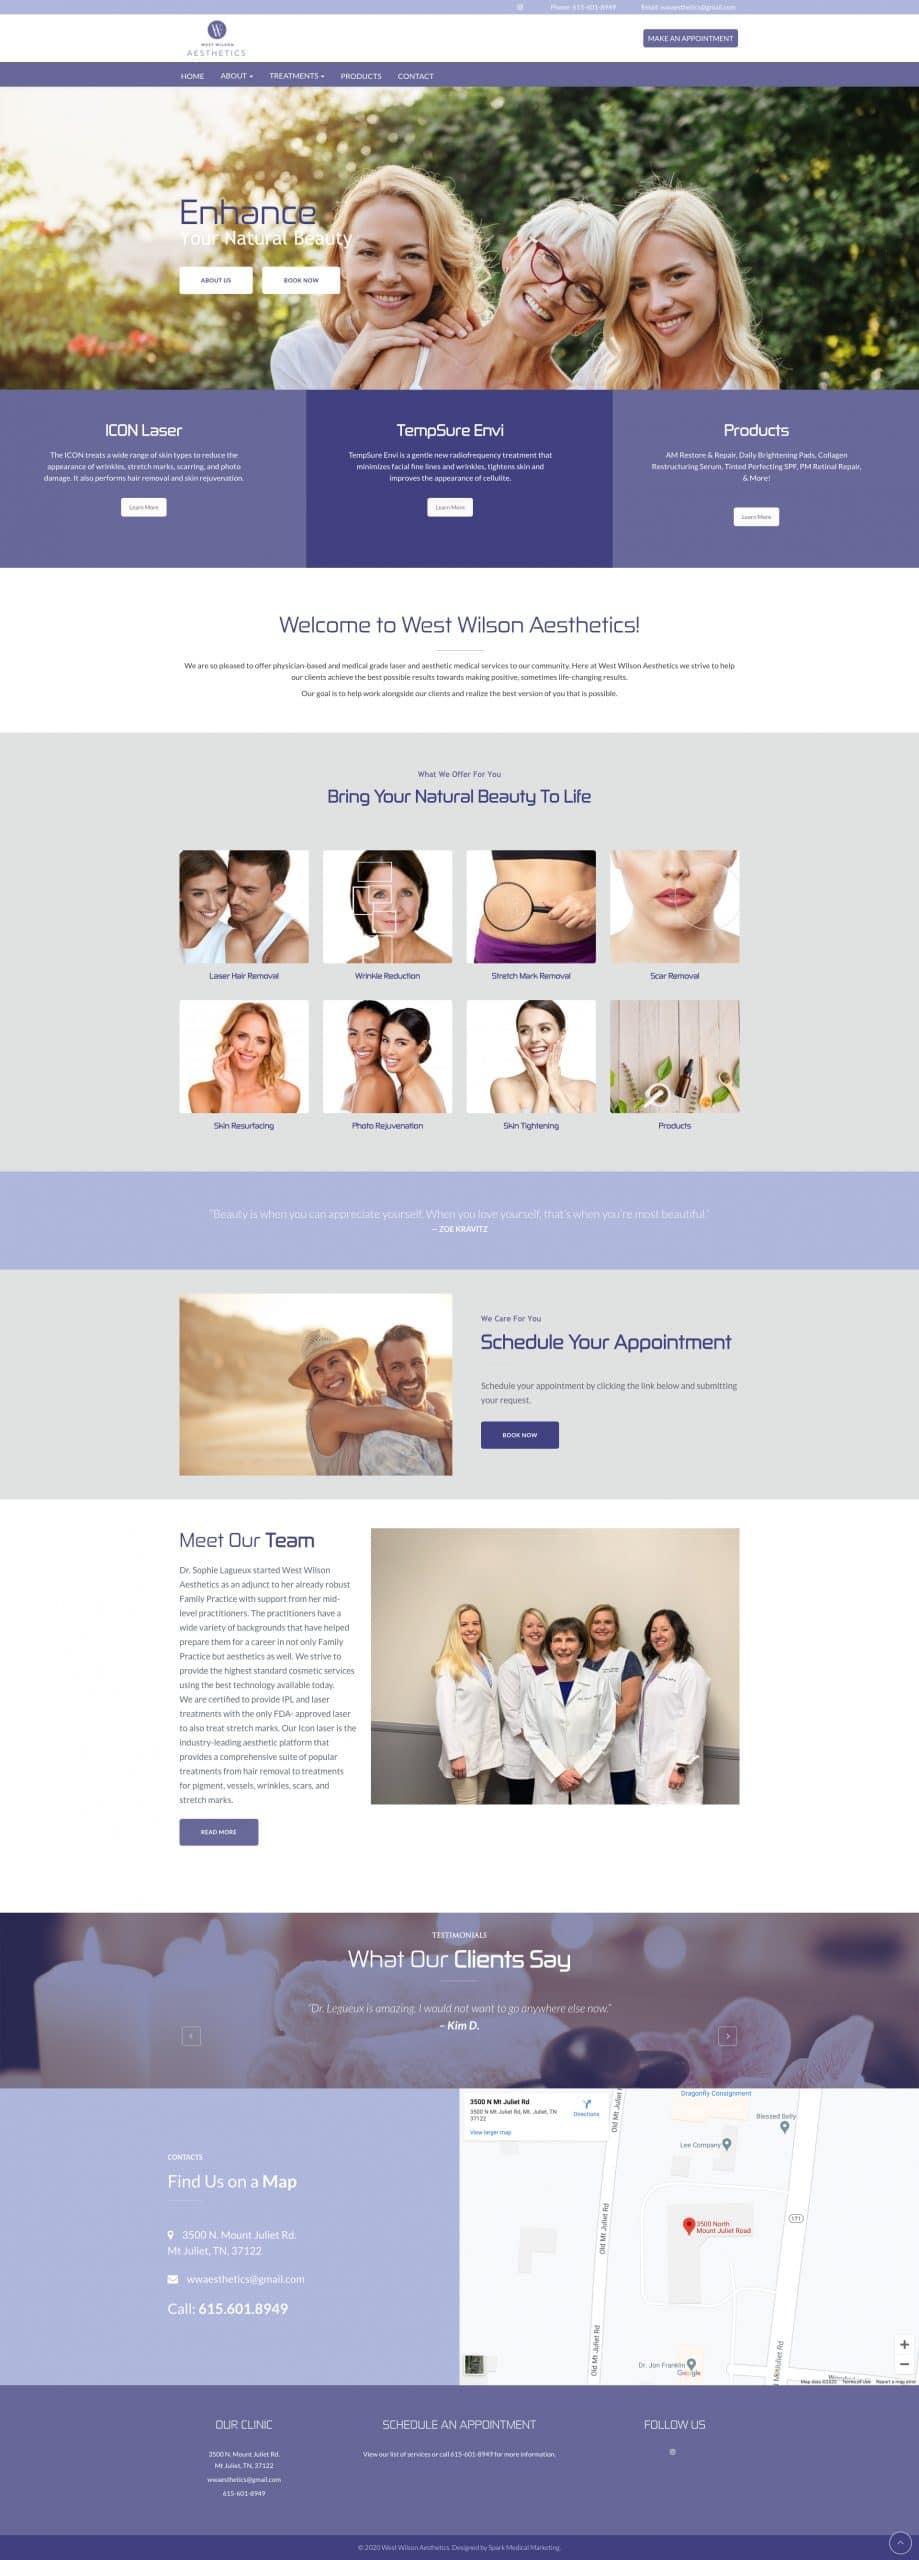 West Wilson Aesthetics Homepage